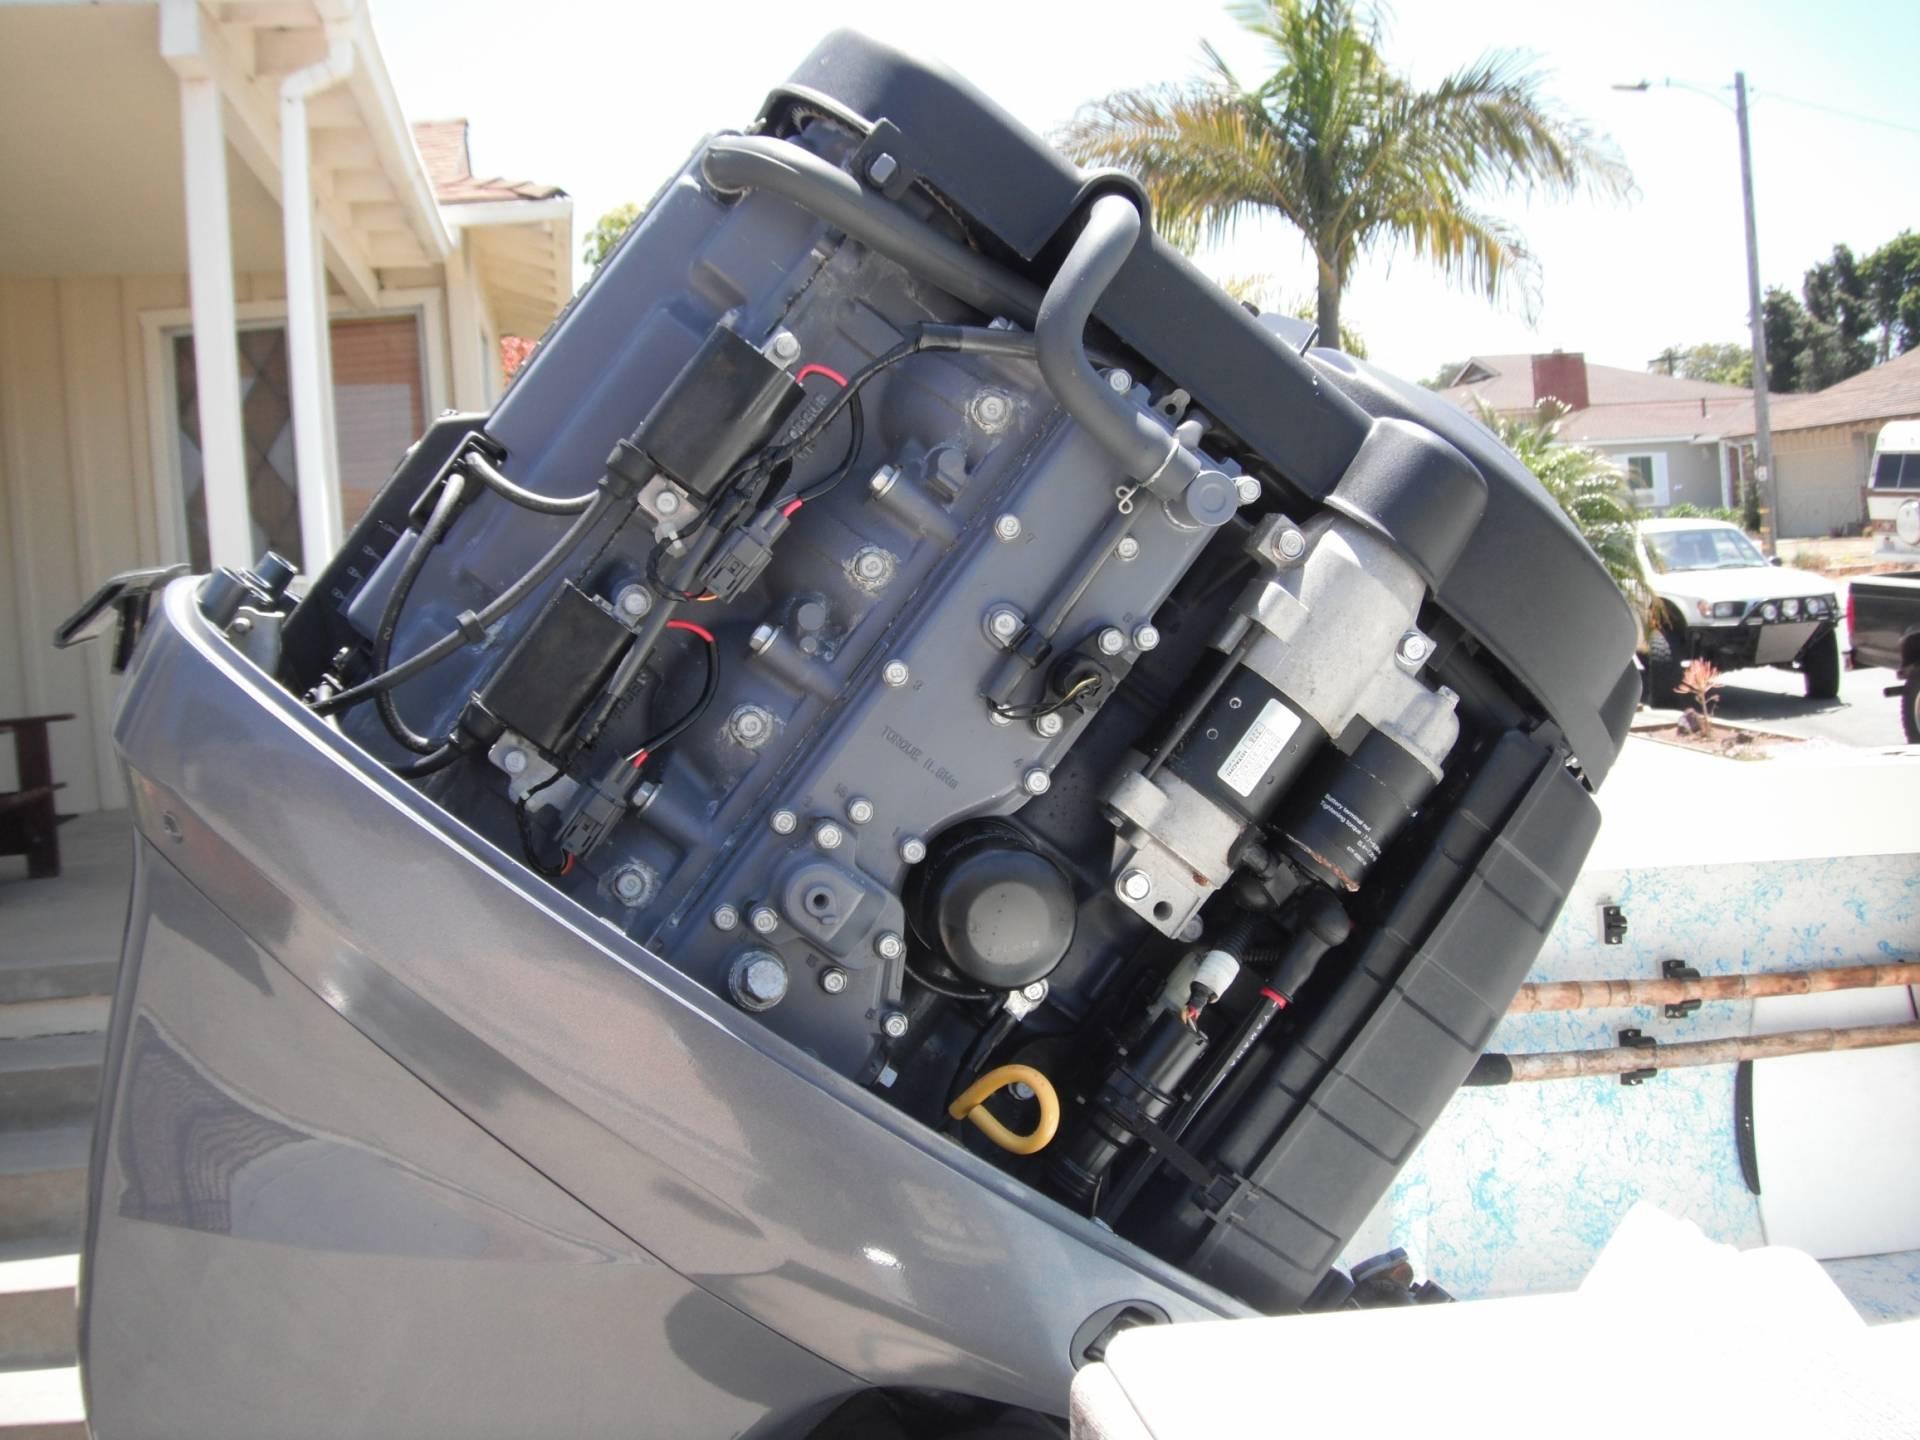 yamaha 90 outboard 2 stroke wiring, 2008 yamaha outboard tach wiring, yamaha outboard control wiring diagram, on yamaha f115 wiring diagram